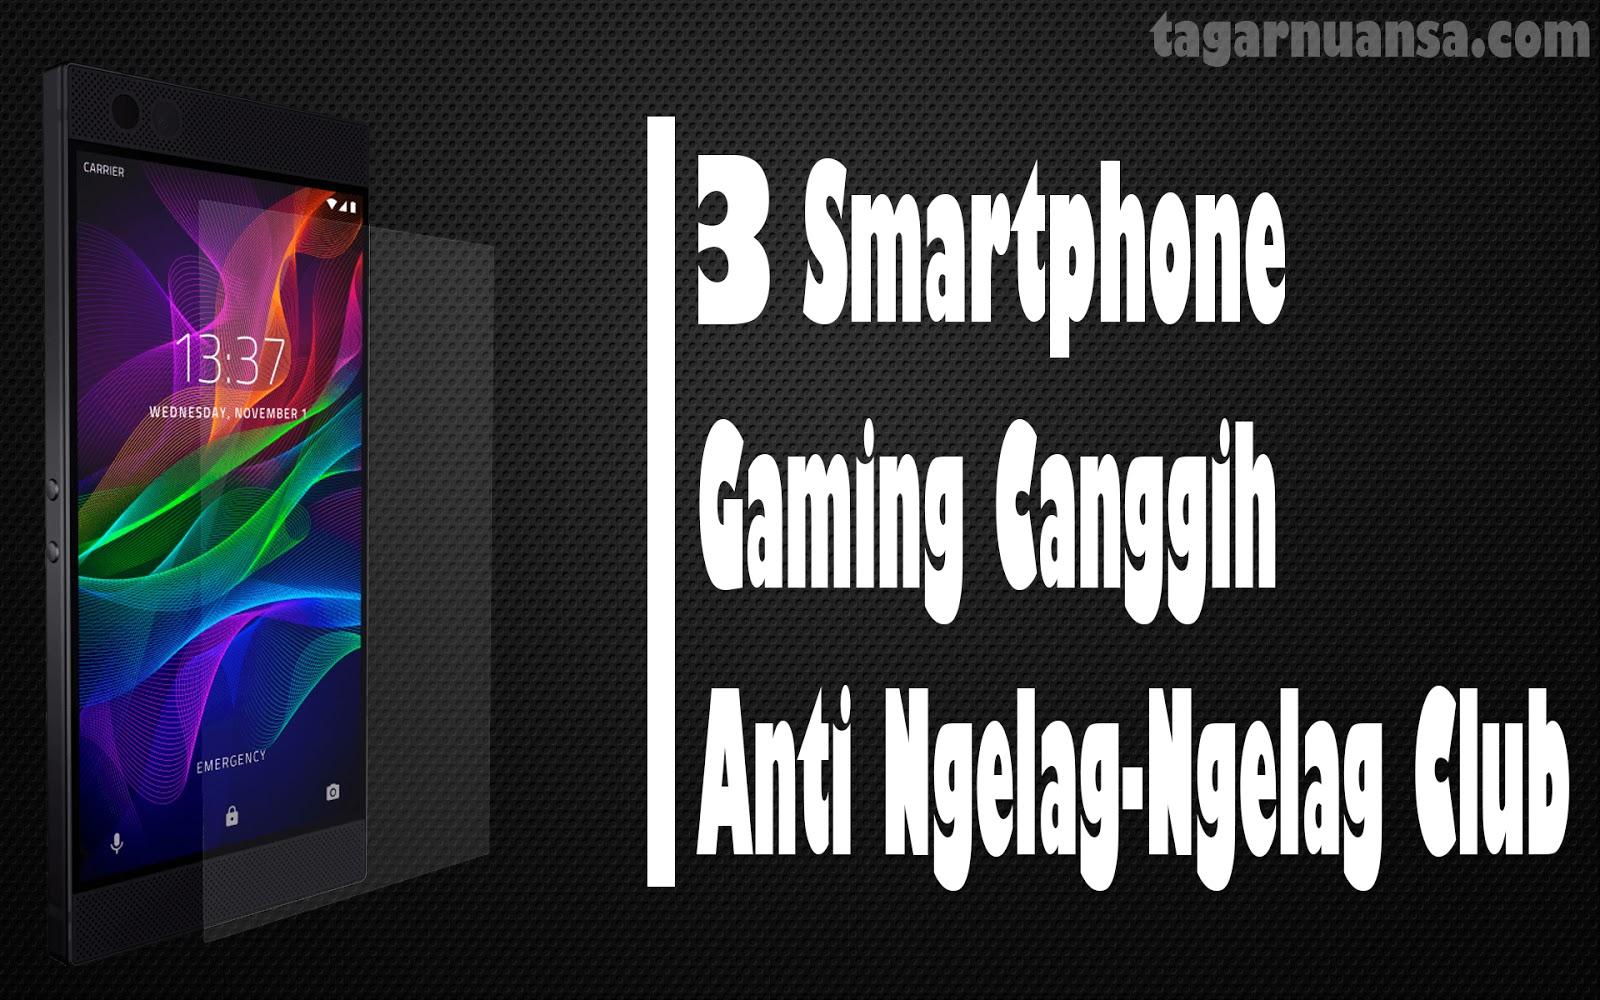 3 smartphone gaming